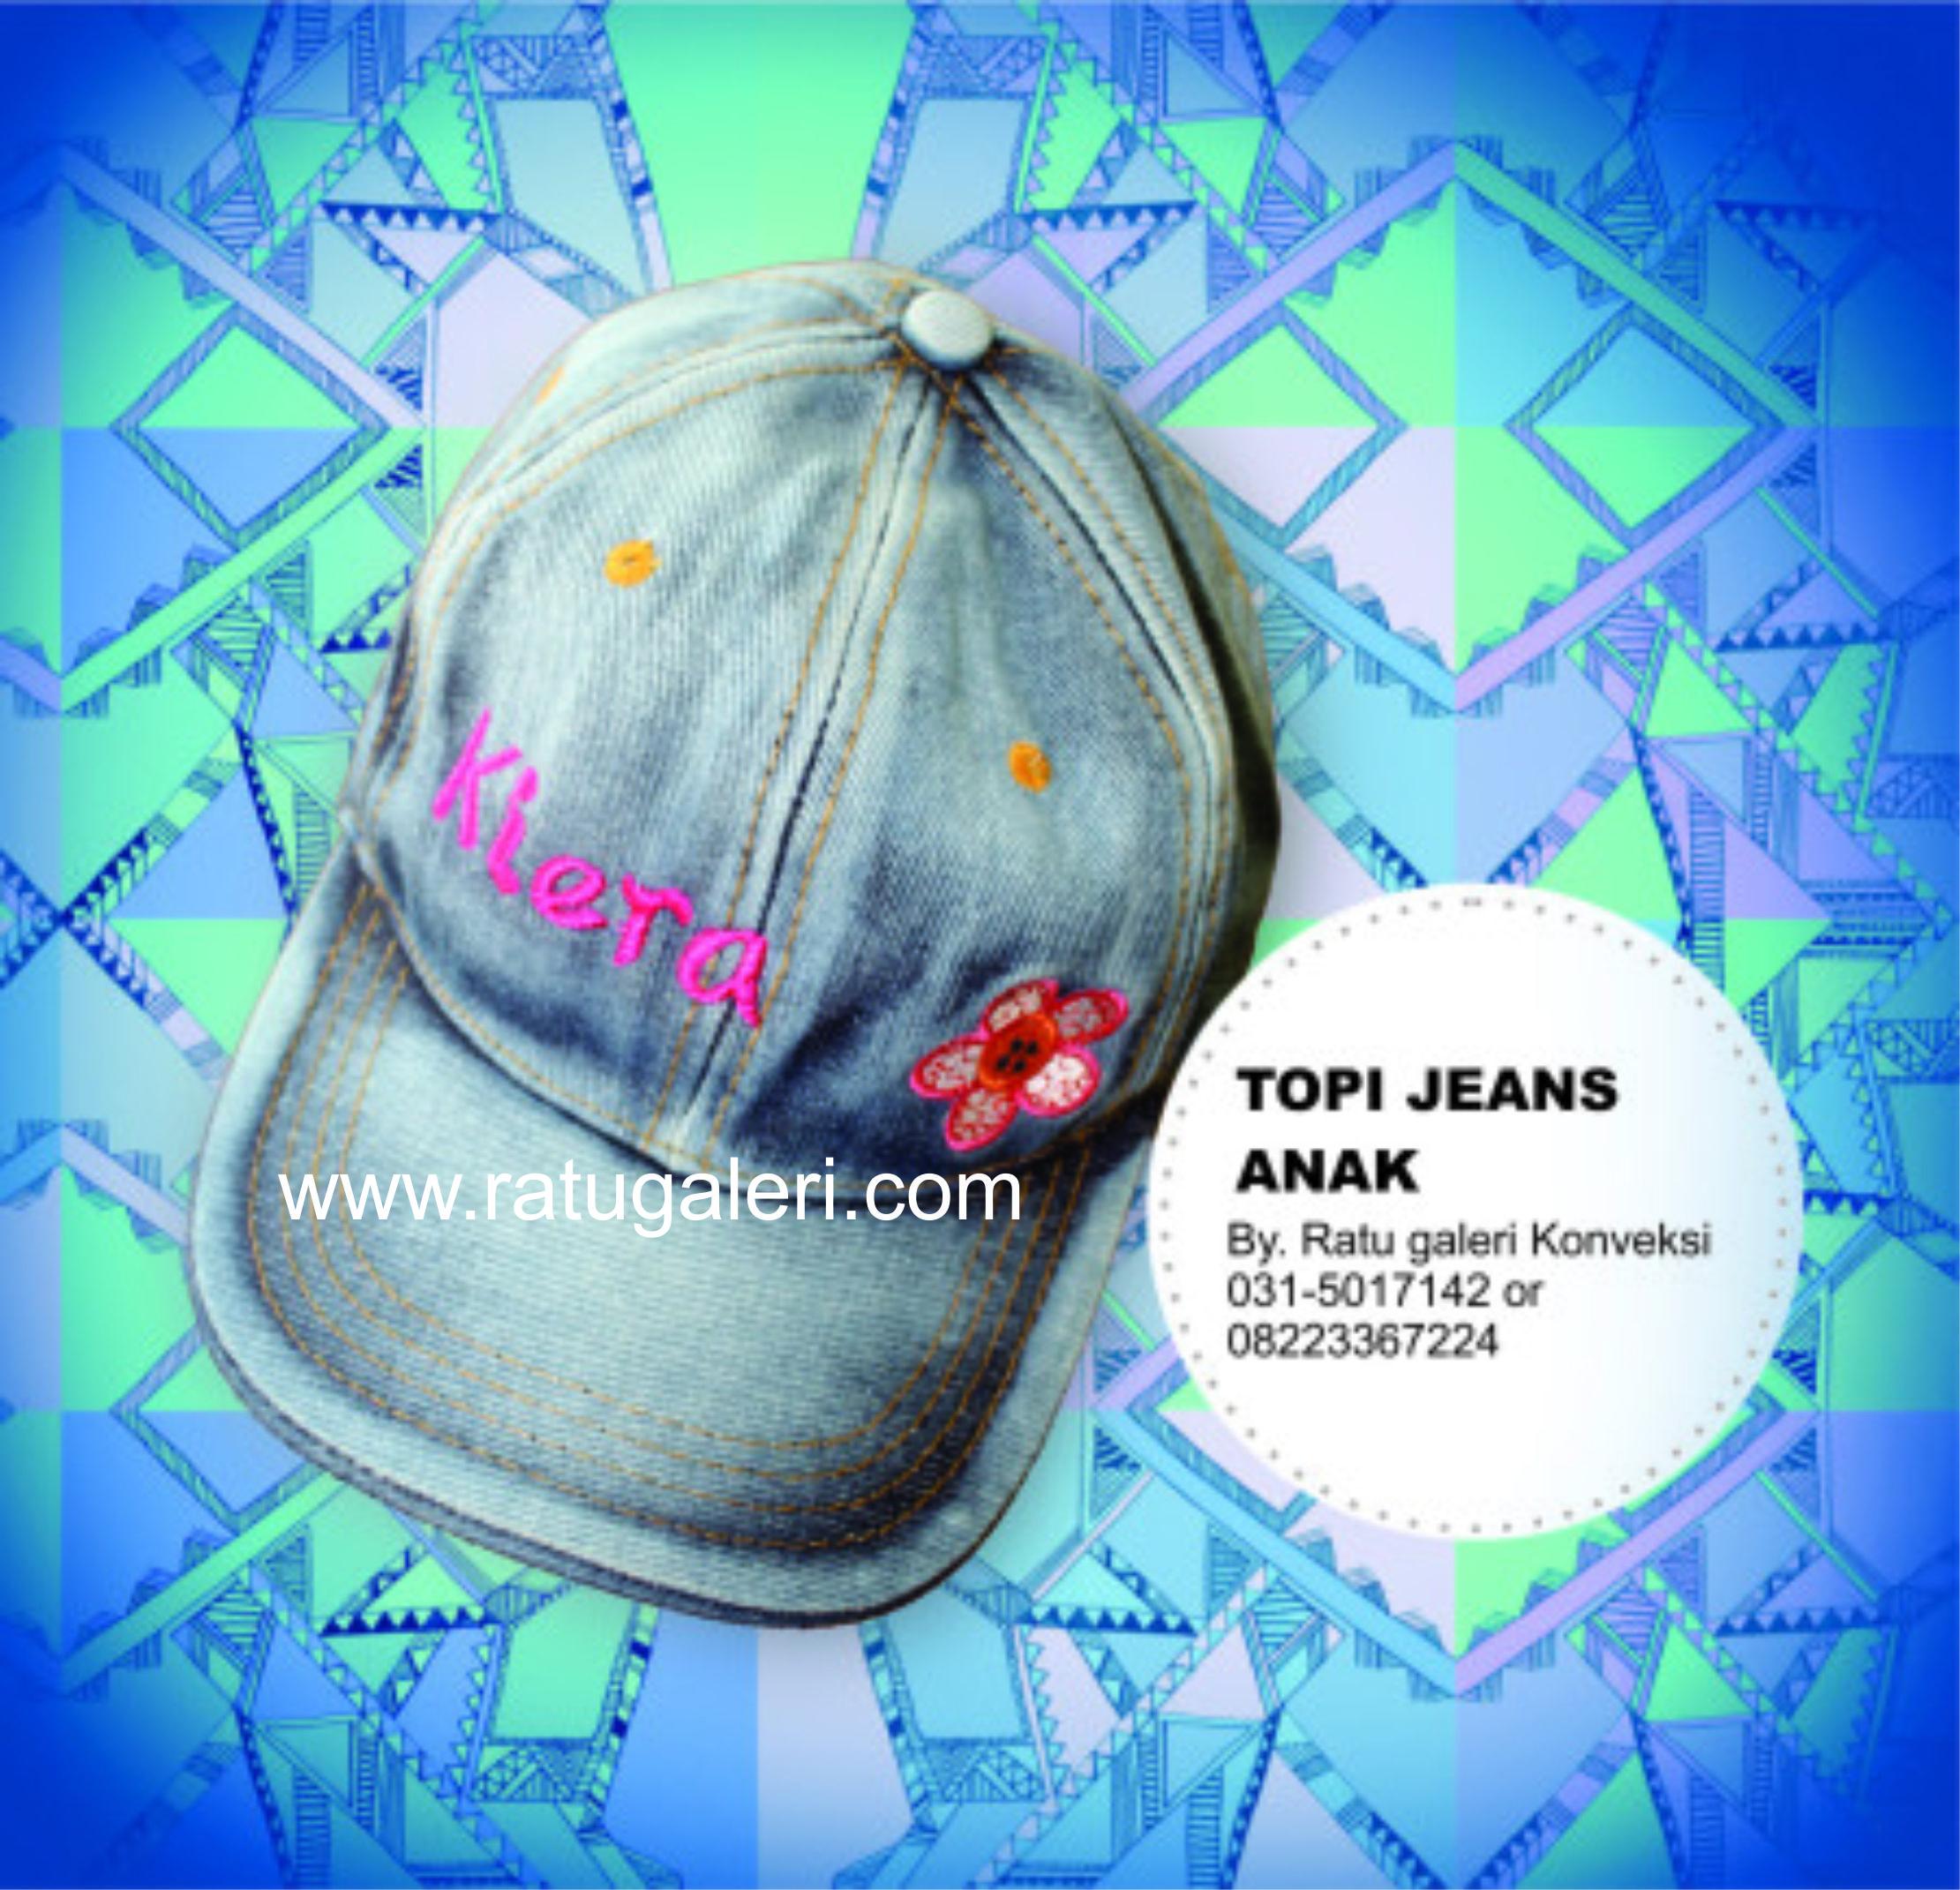 Contoh Desain Topi Jeans Anak